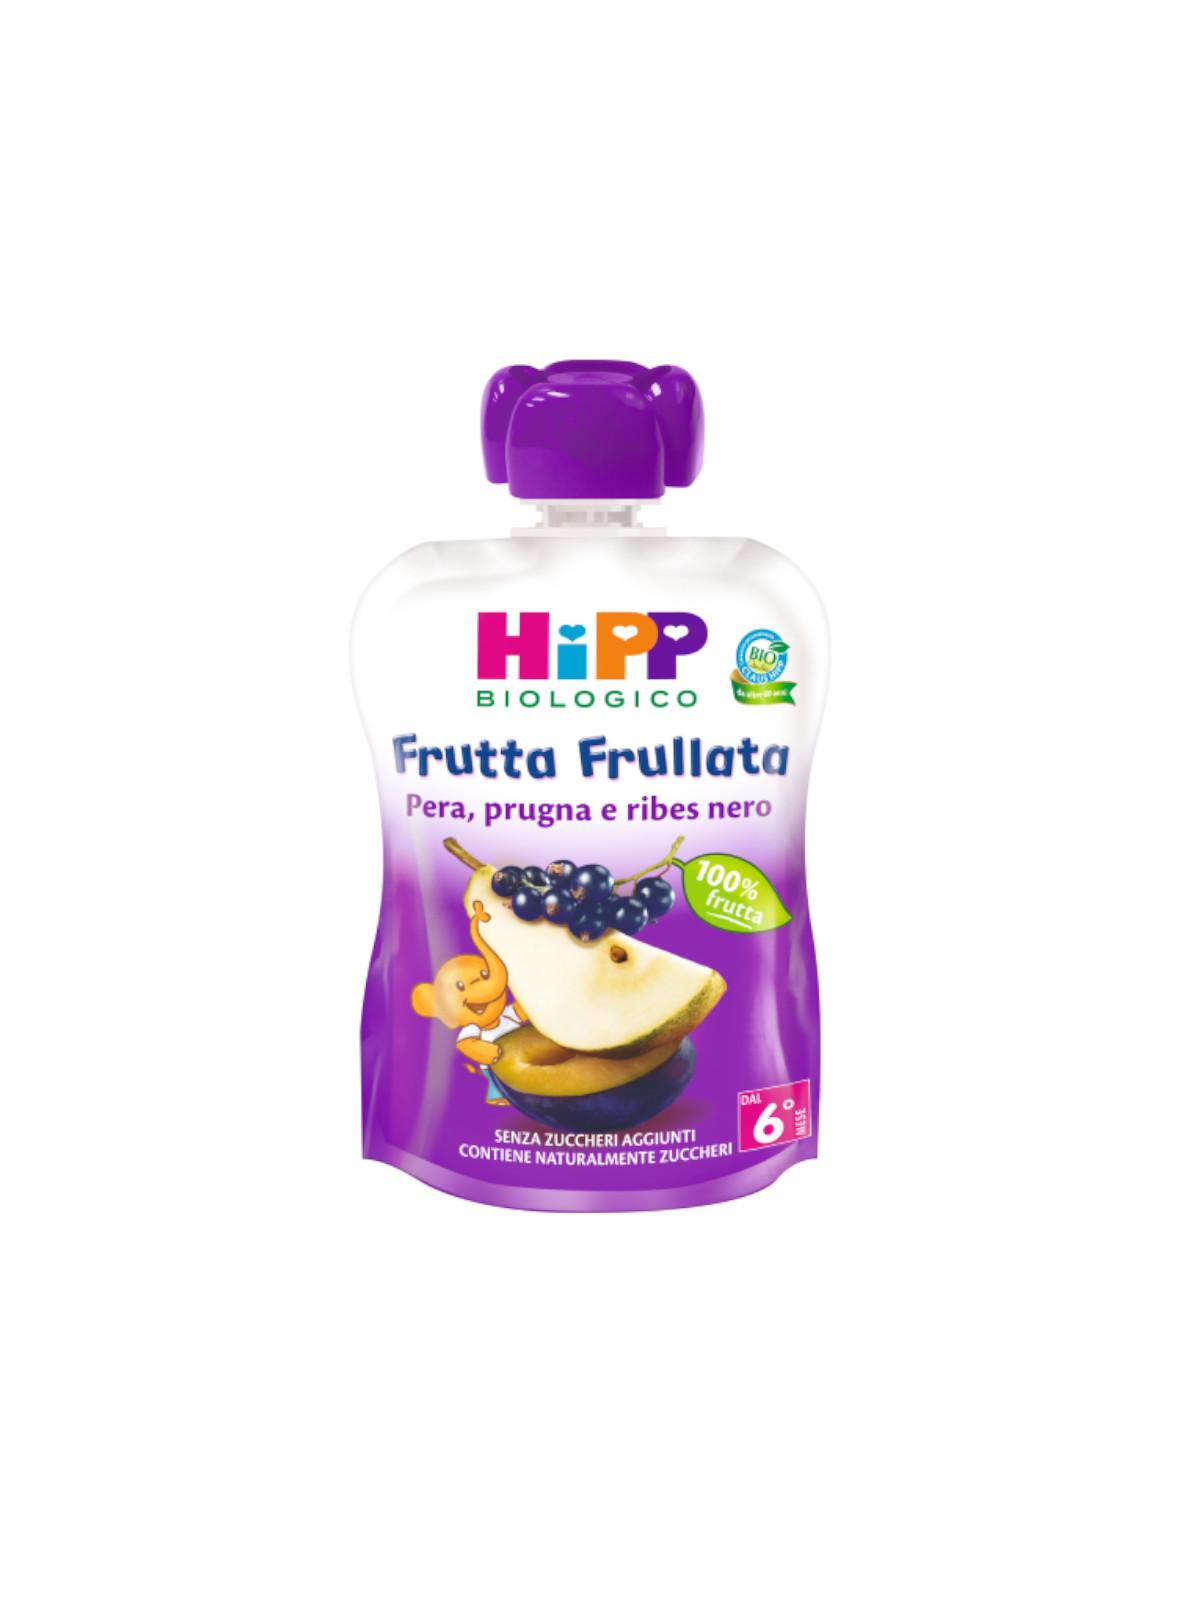 Frutta frullata pera prugna ribes 90g - Hipp